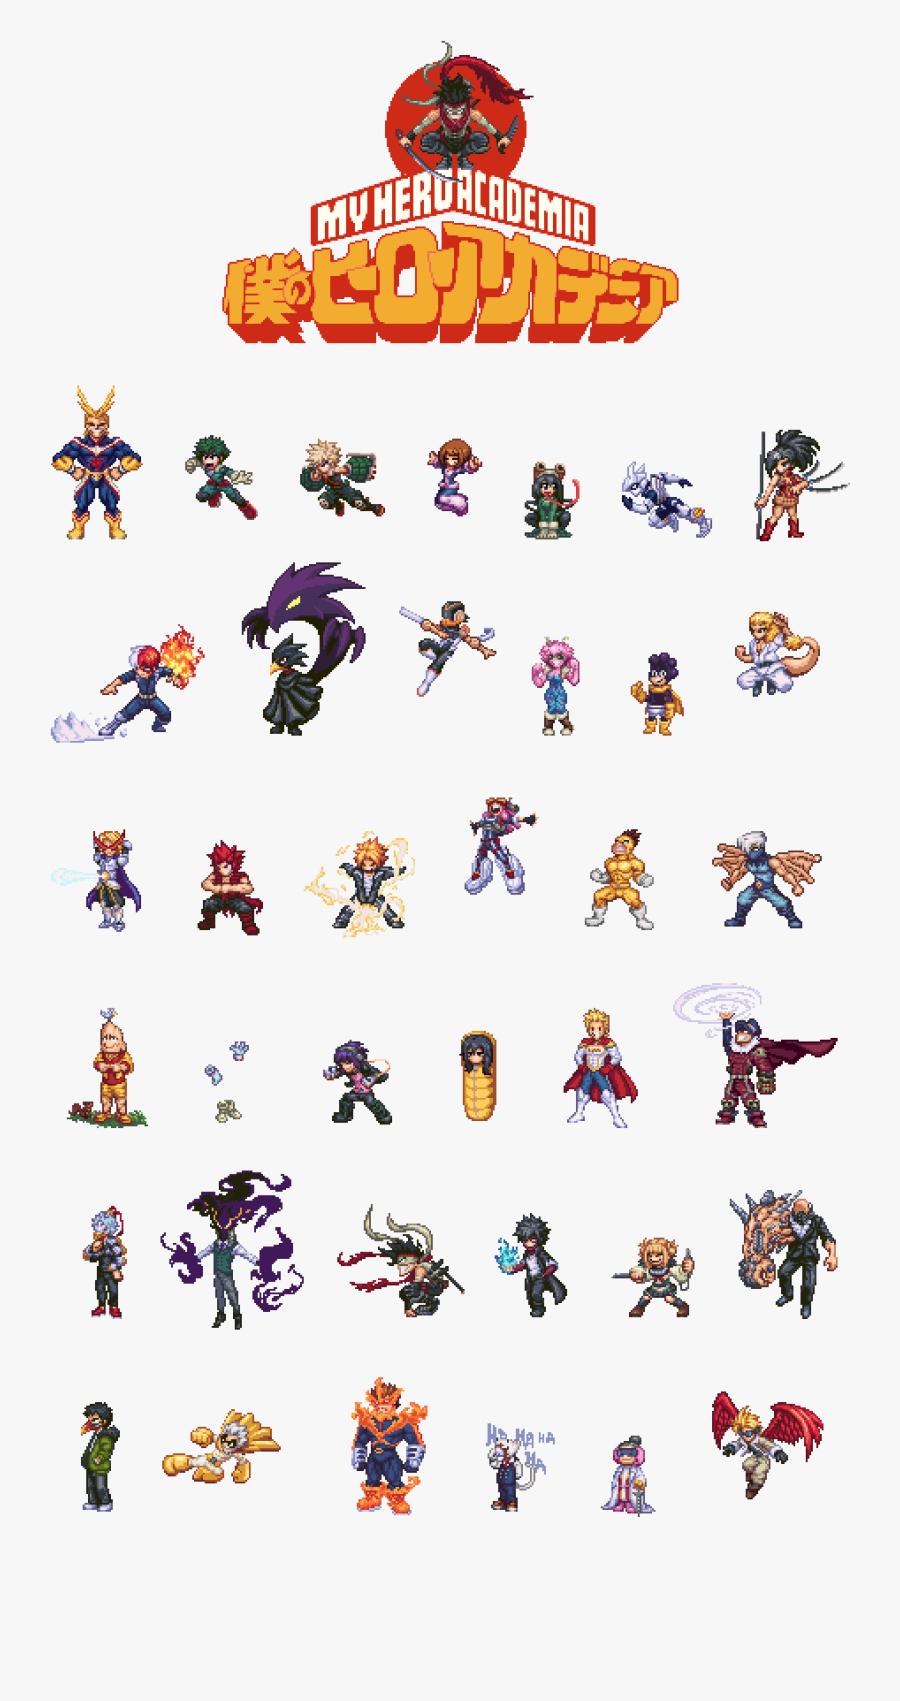 Transparent My Hero Academia Png - My Hero Academia Pixel Art, Transparent Clipart